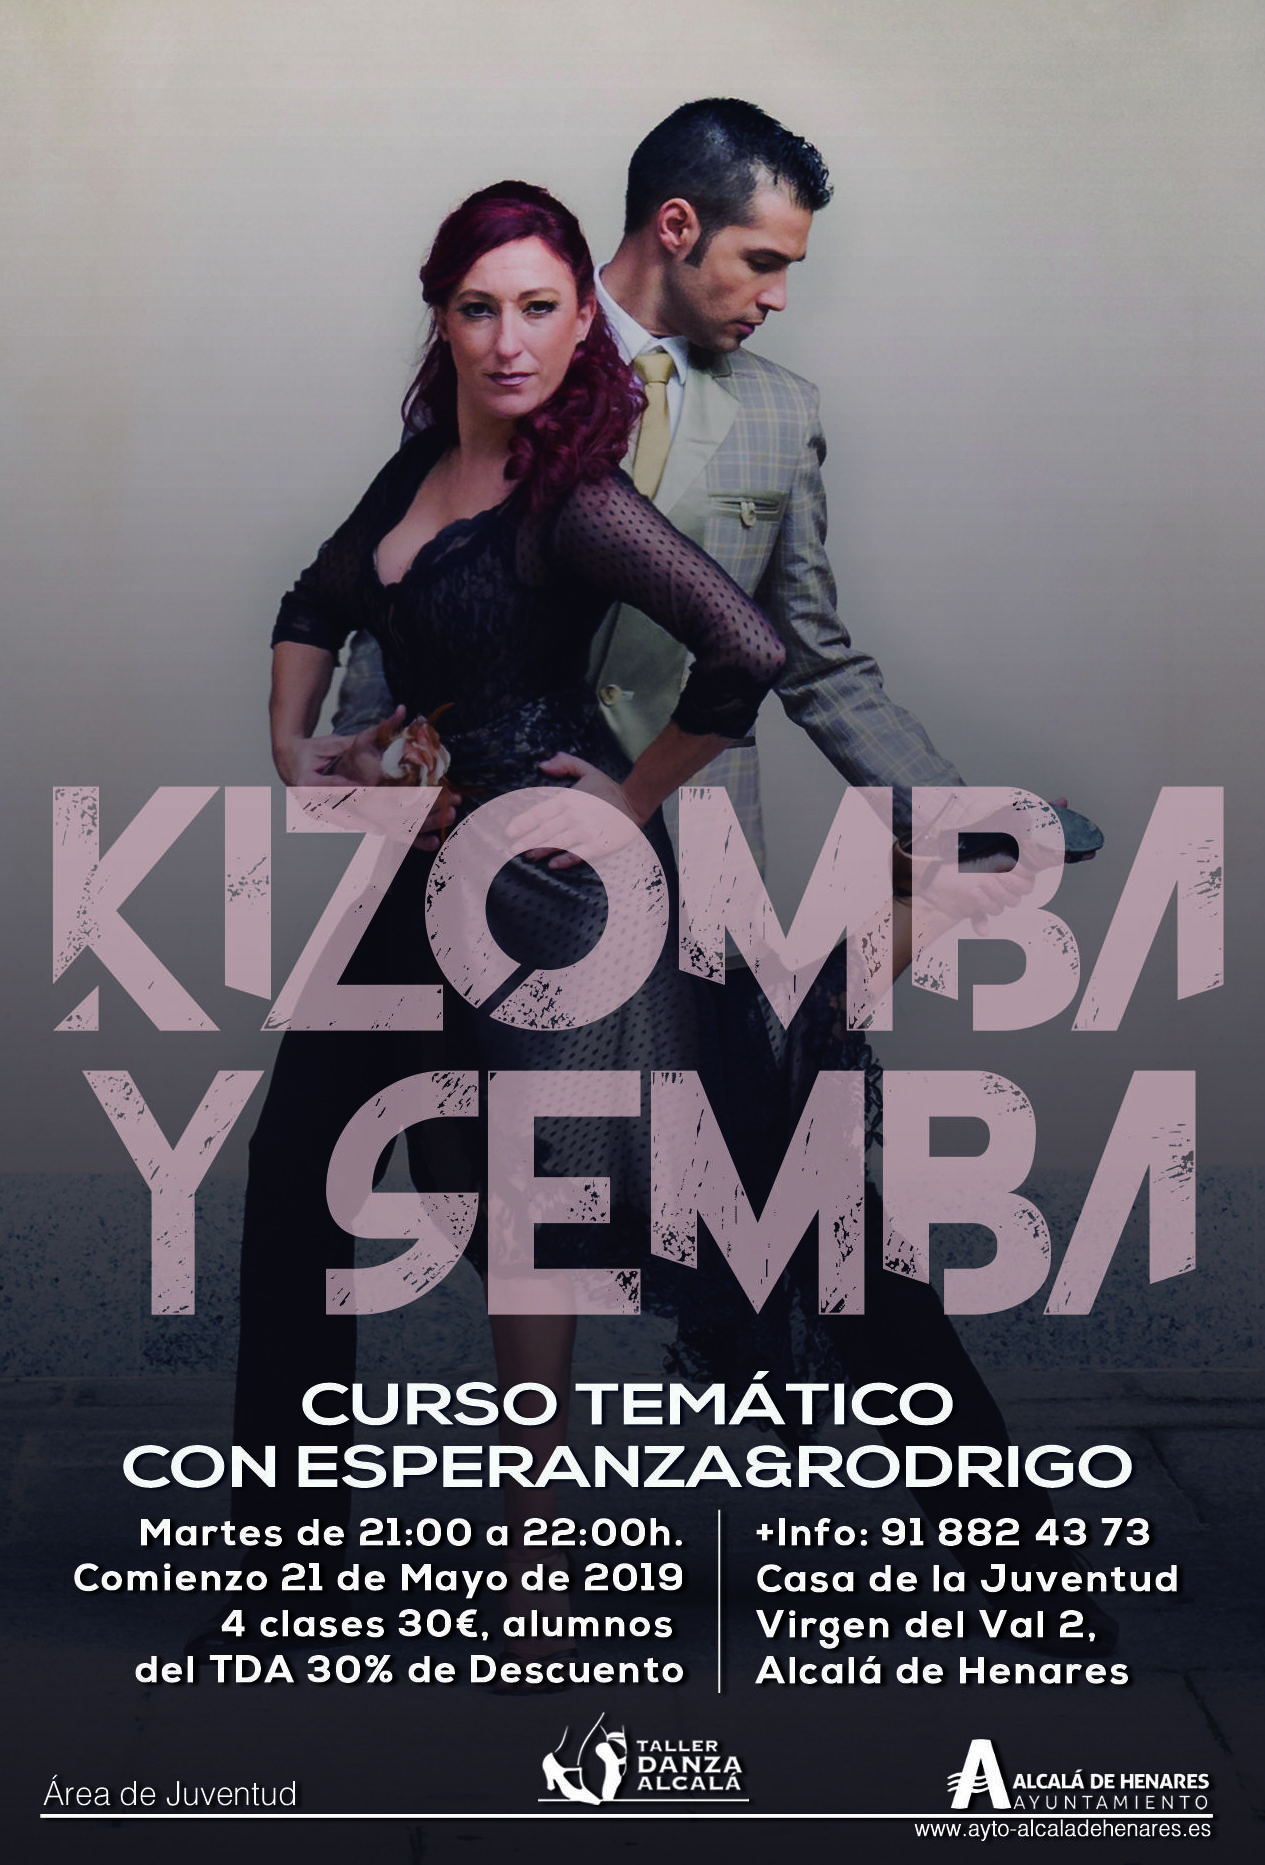 TEMATICO DE KIZOMBA Y SEMBA